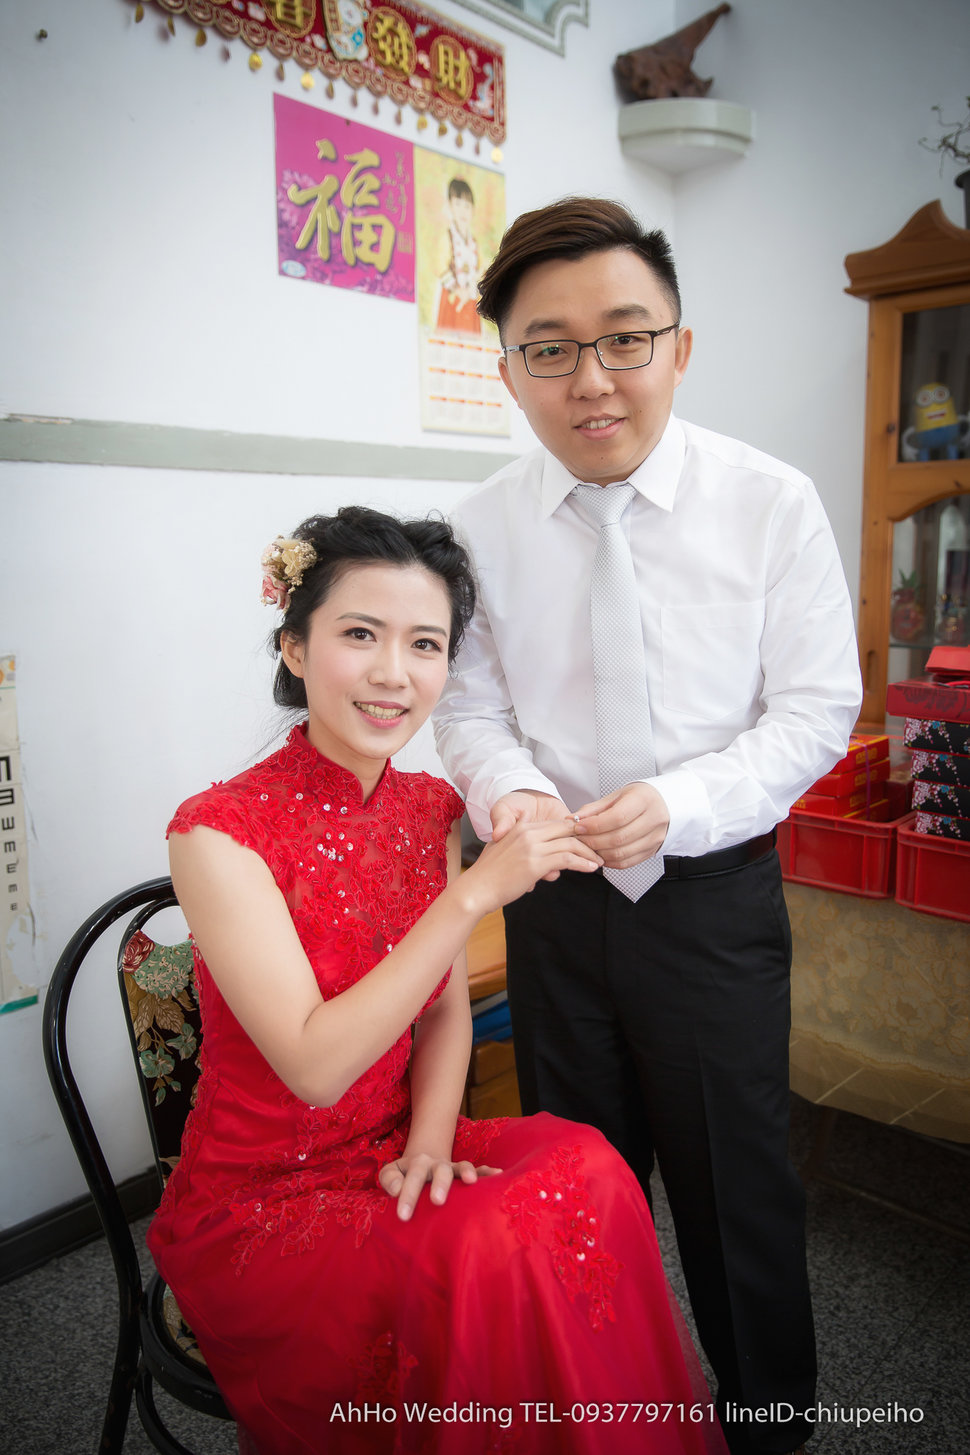 AhHo Wedding TEL-0937797161 lineID-chiupeiho (41 - 163) - AhHoWedding/阿河婚攝《結婚吧》